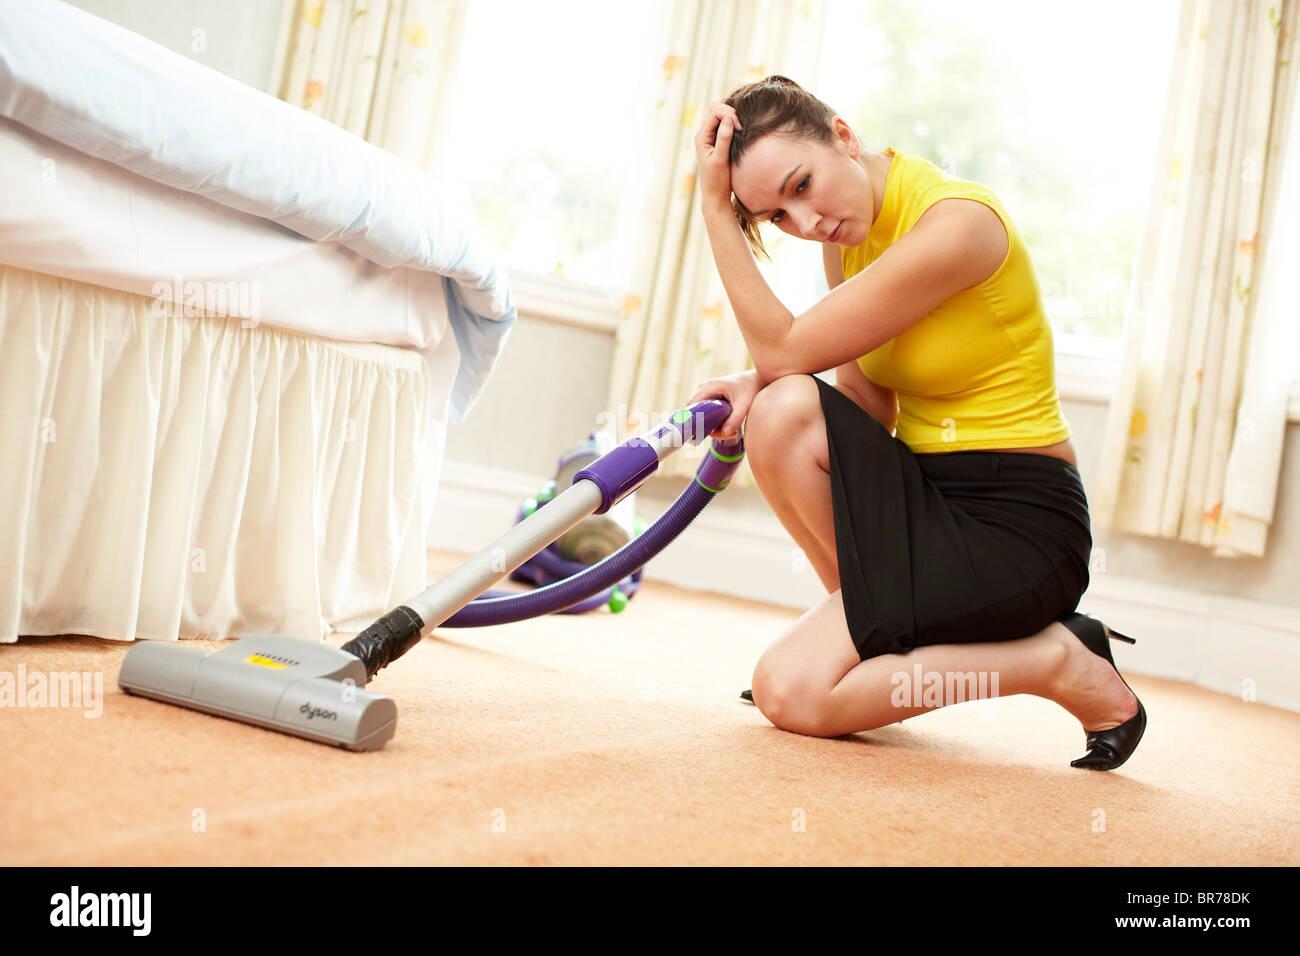 Woman using vacuum cleaner - Stock Image